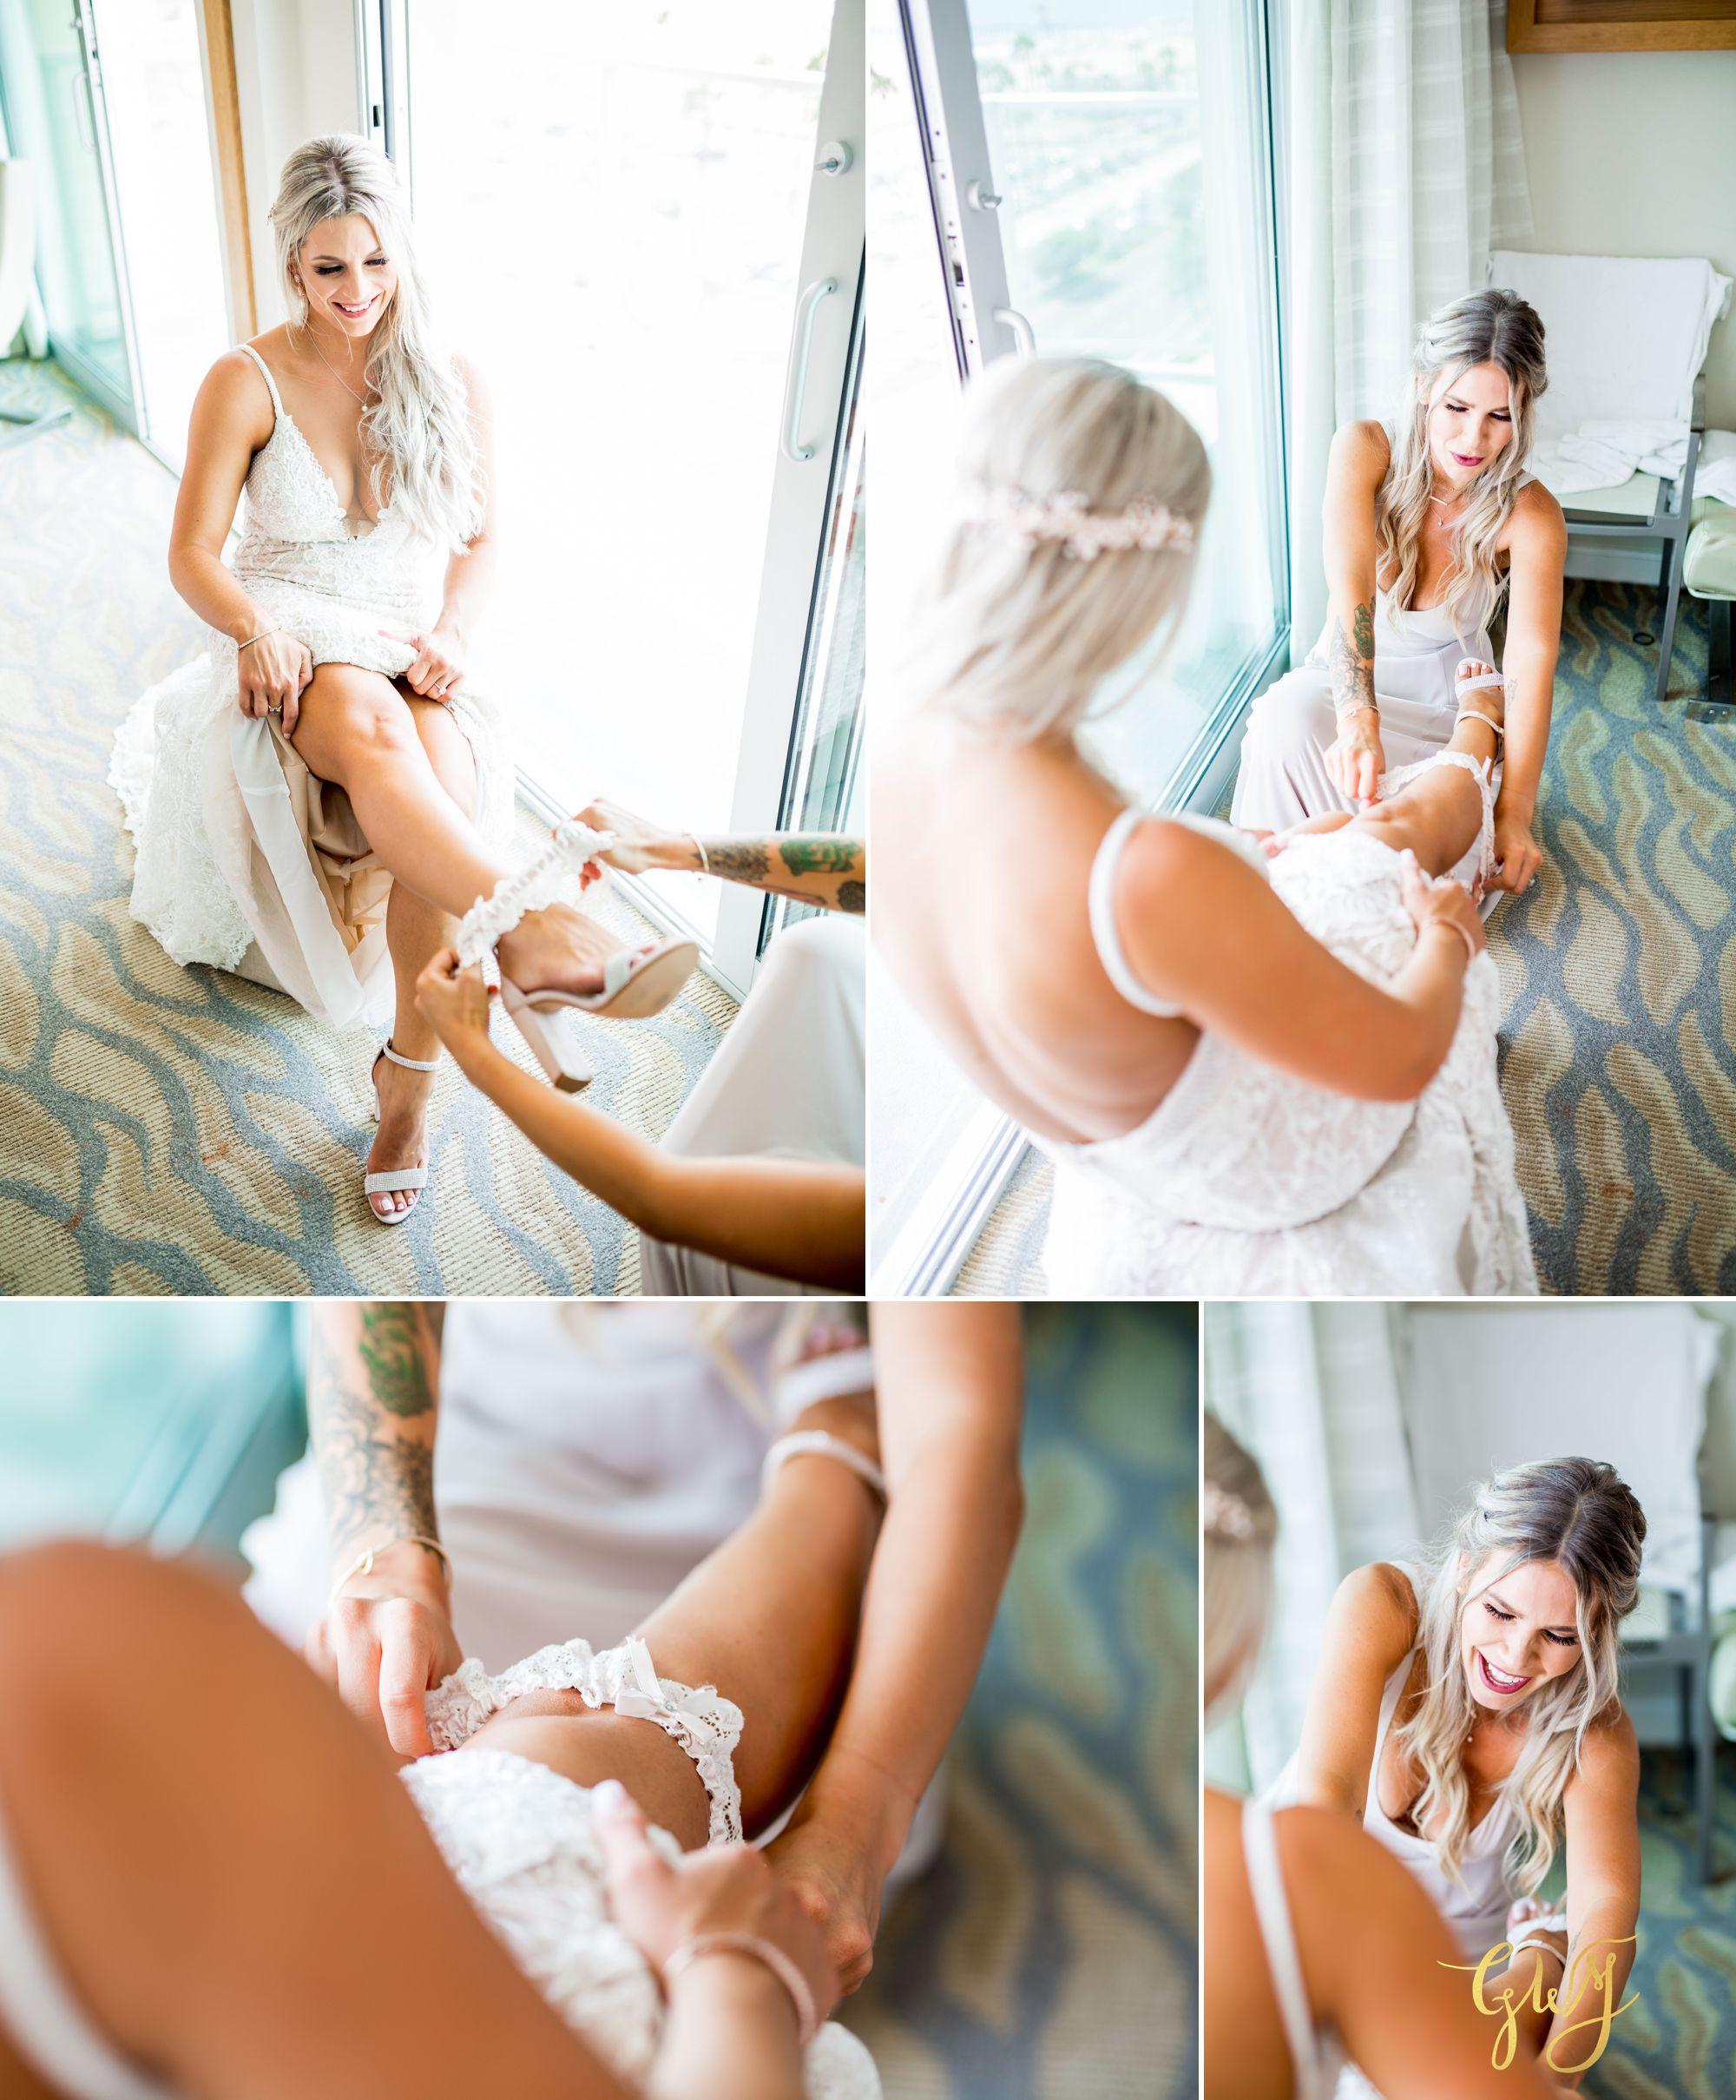 Christien + Crystal Pasea Hotel & Spa Huntington Beach Wedding by Glass Woods Media 17.jpg